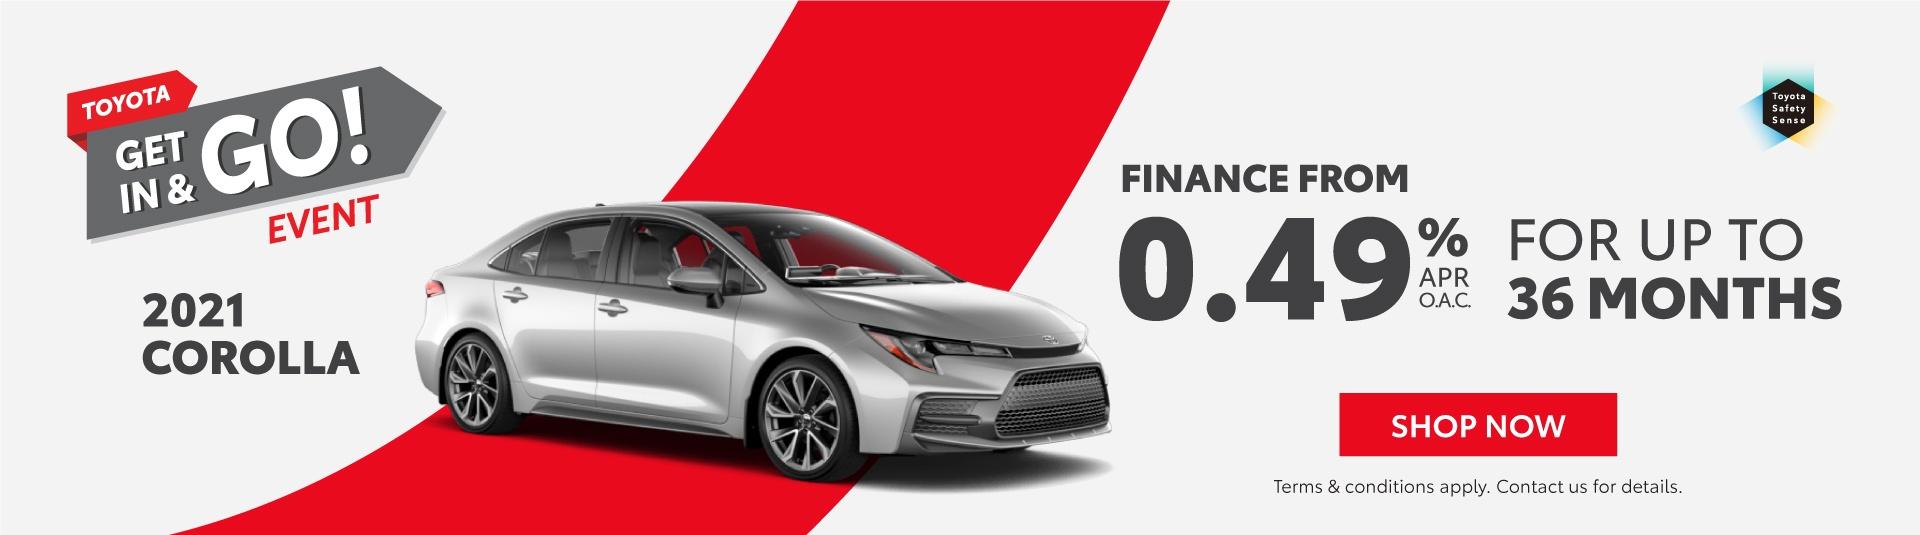 Toyota_Corolla_offer_Georgetown_Toyota